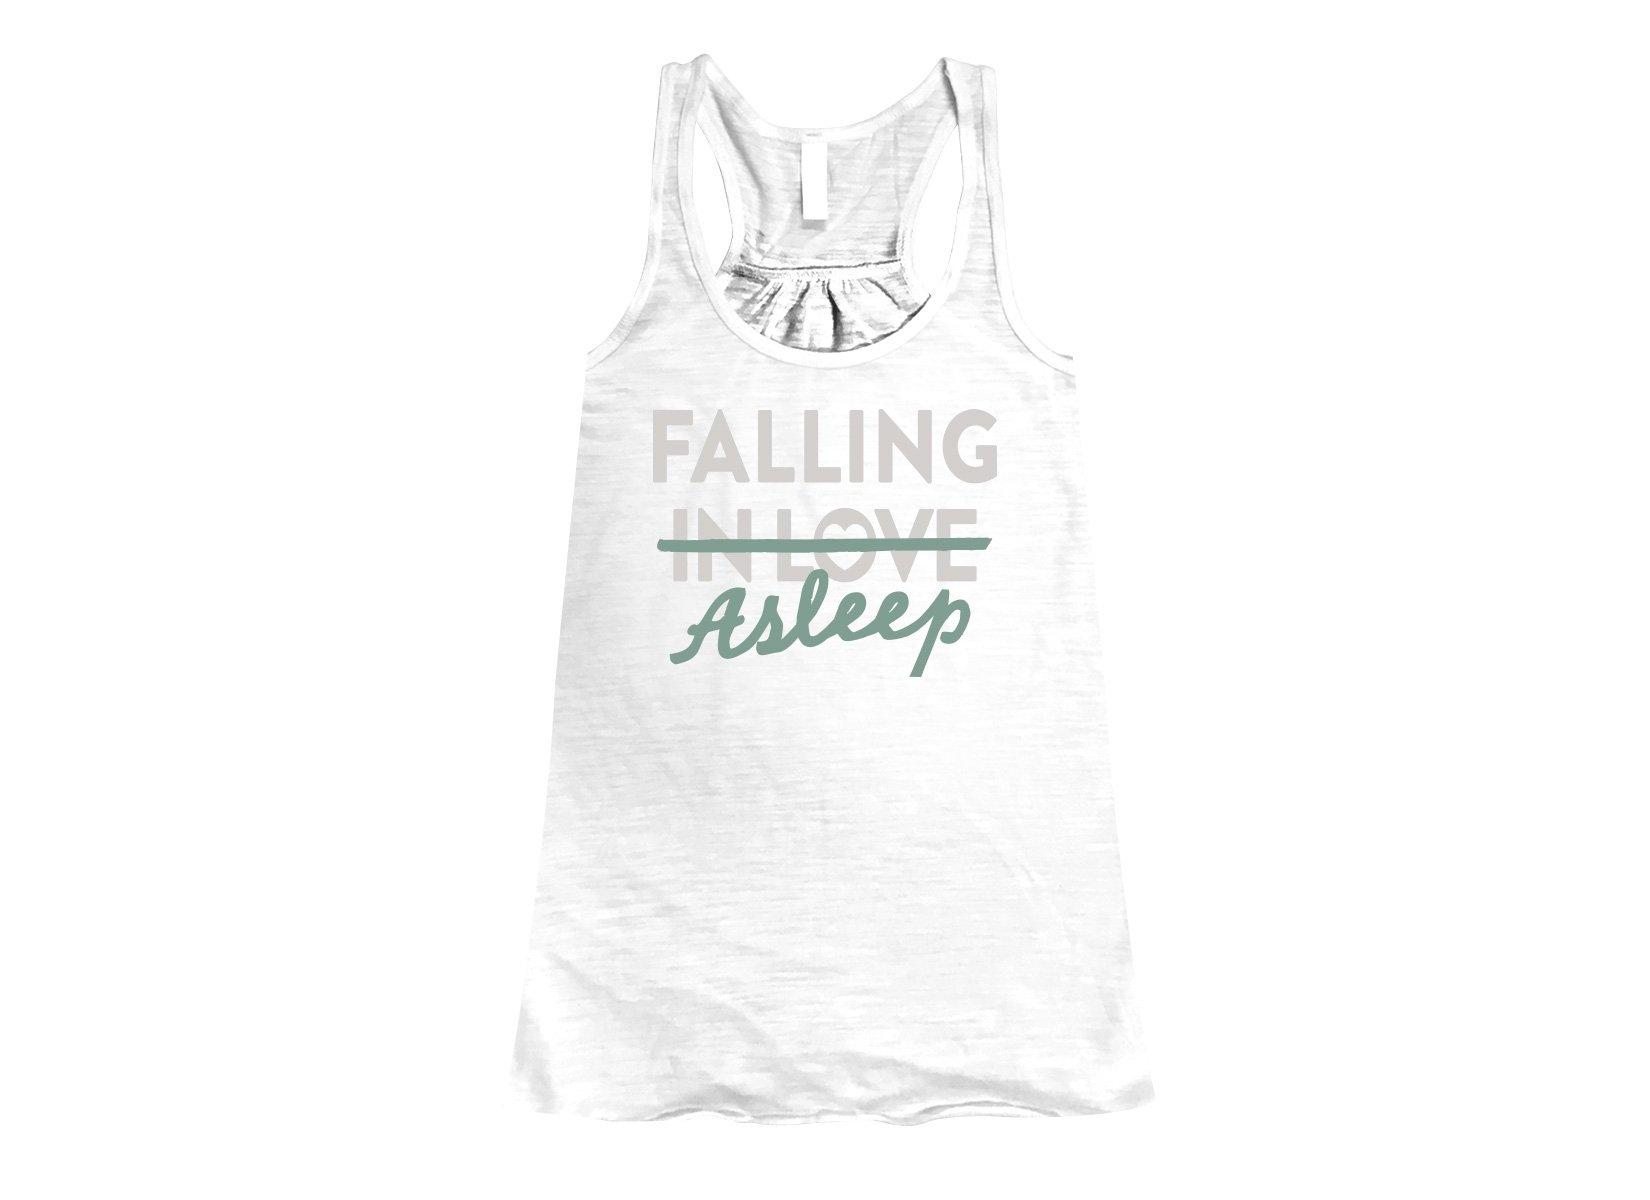 Falling Asleep on Womens Tanks T-Shirt